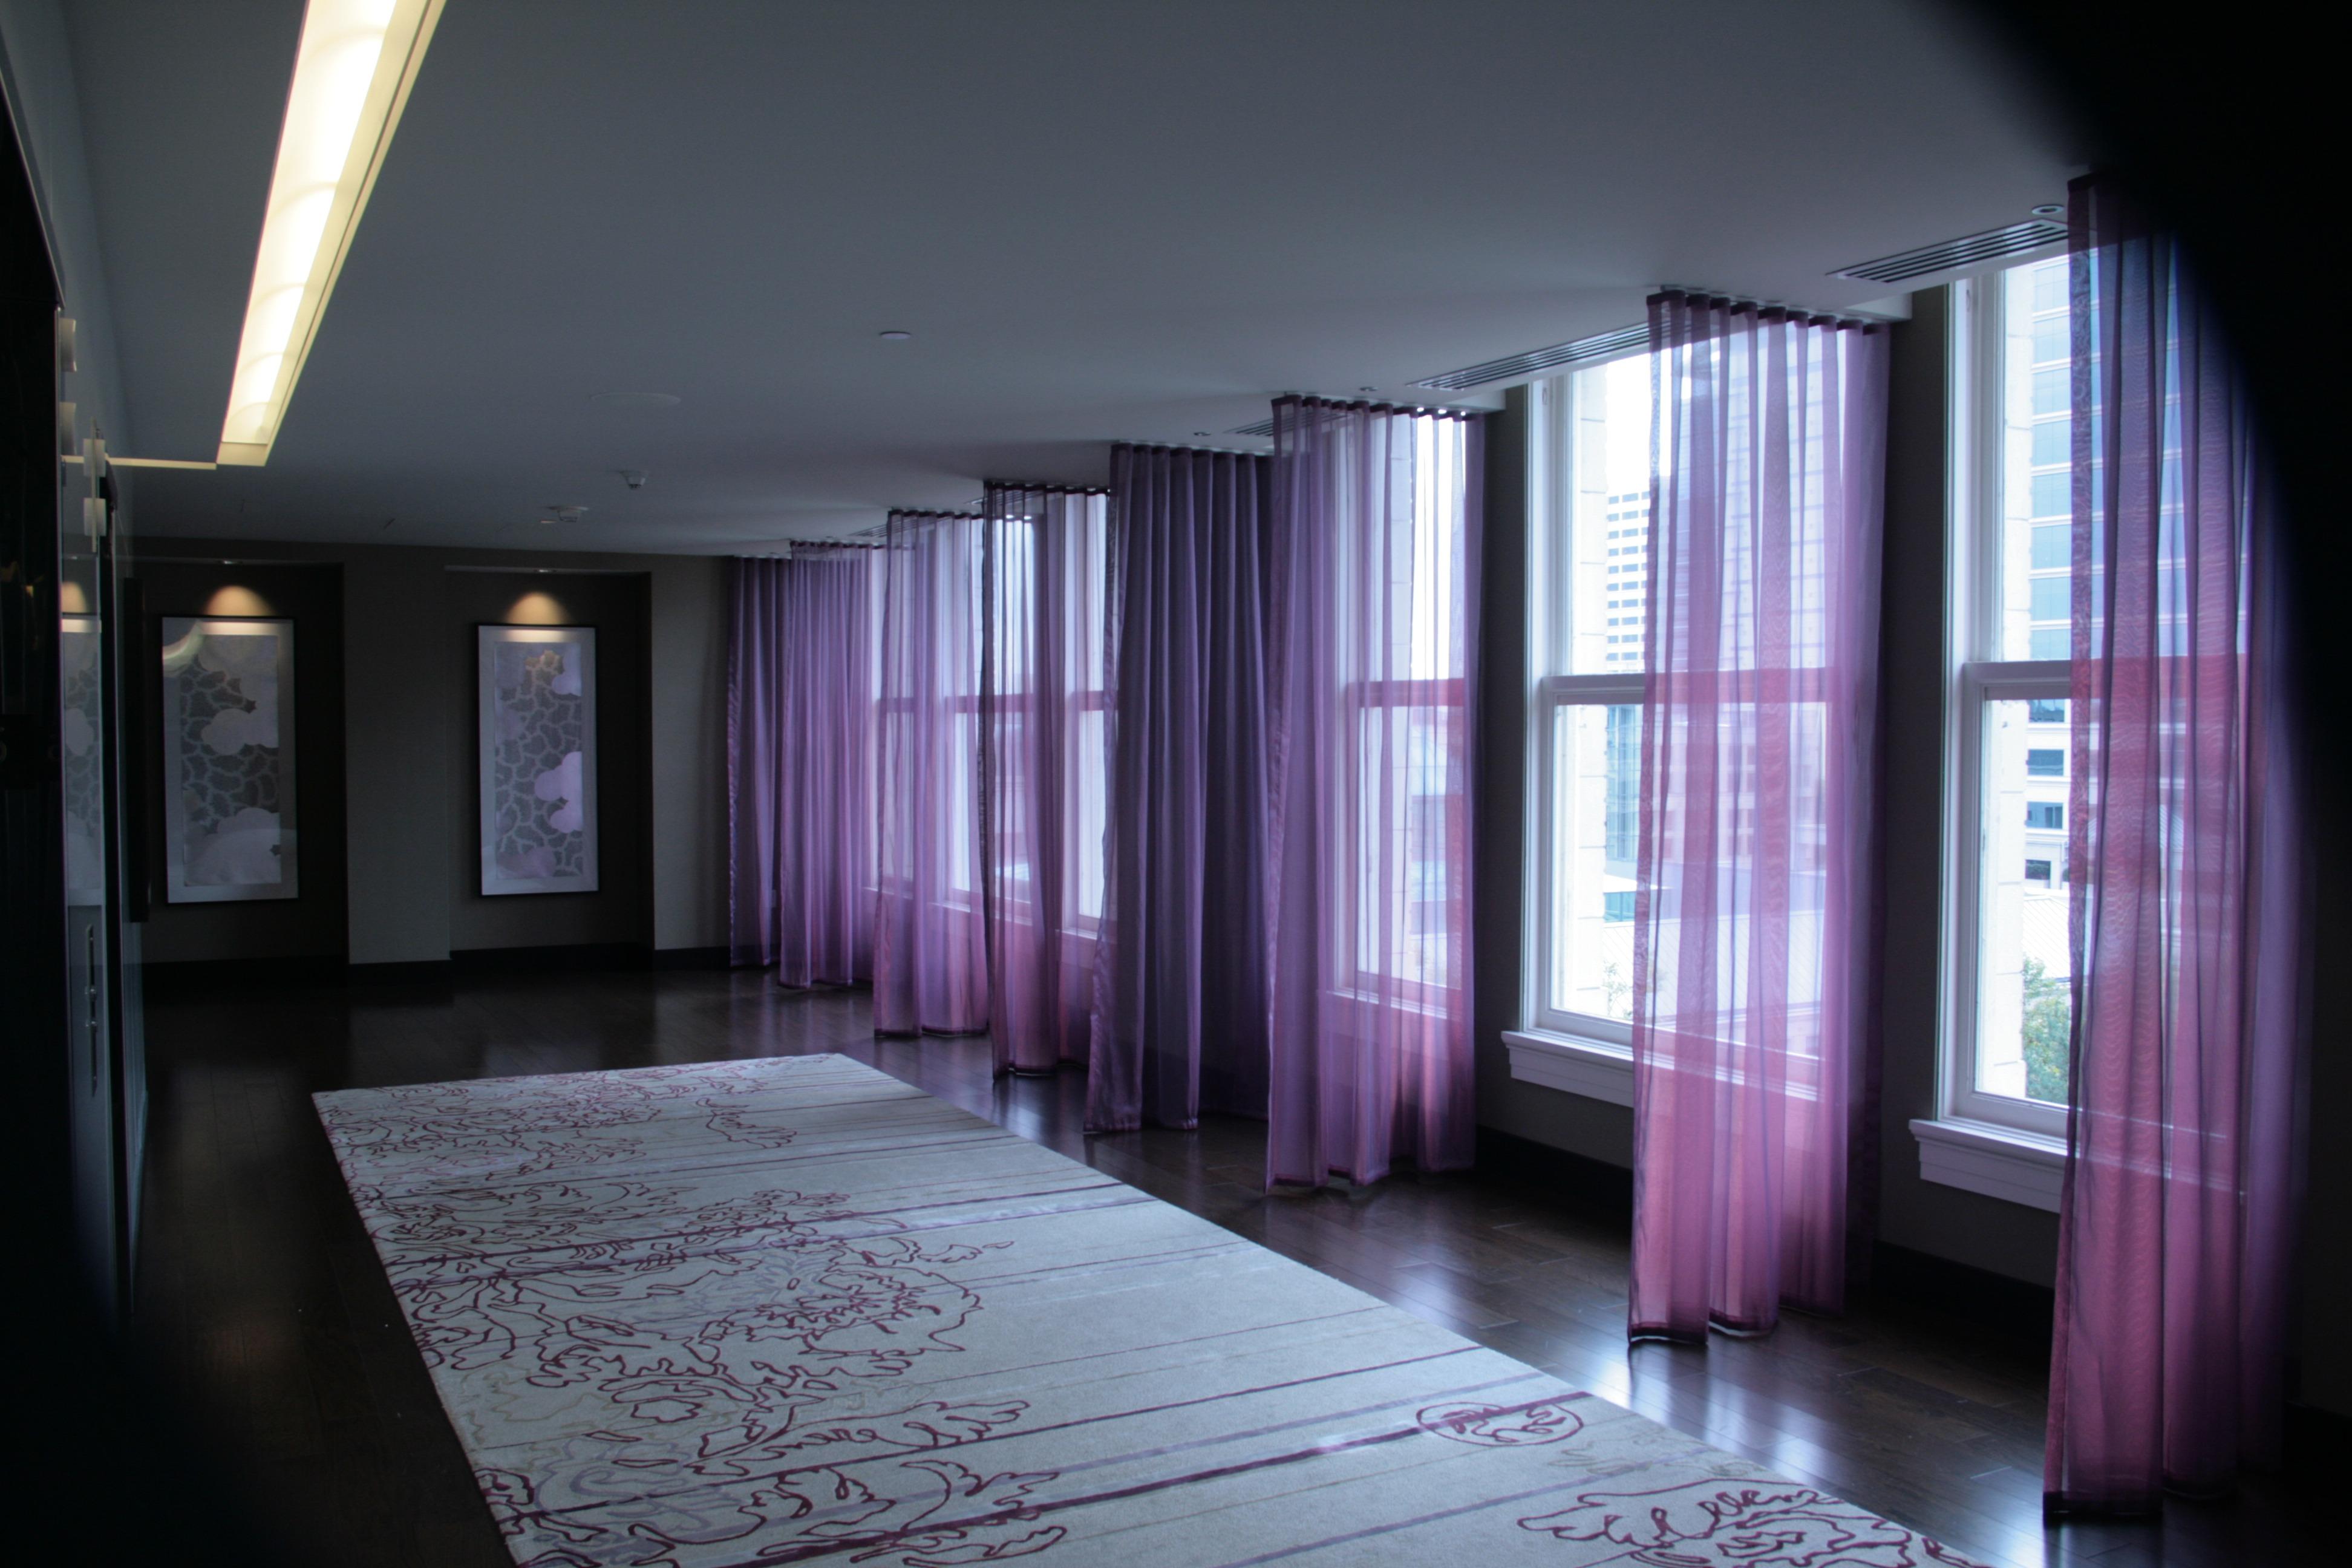 Gambar Cahaya Arsitektur Rumah Ungu Aula Warna Kegelapan